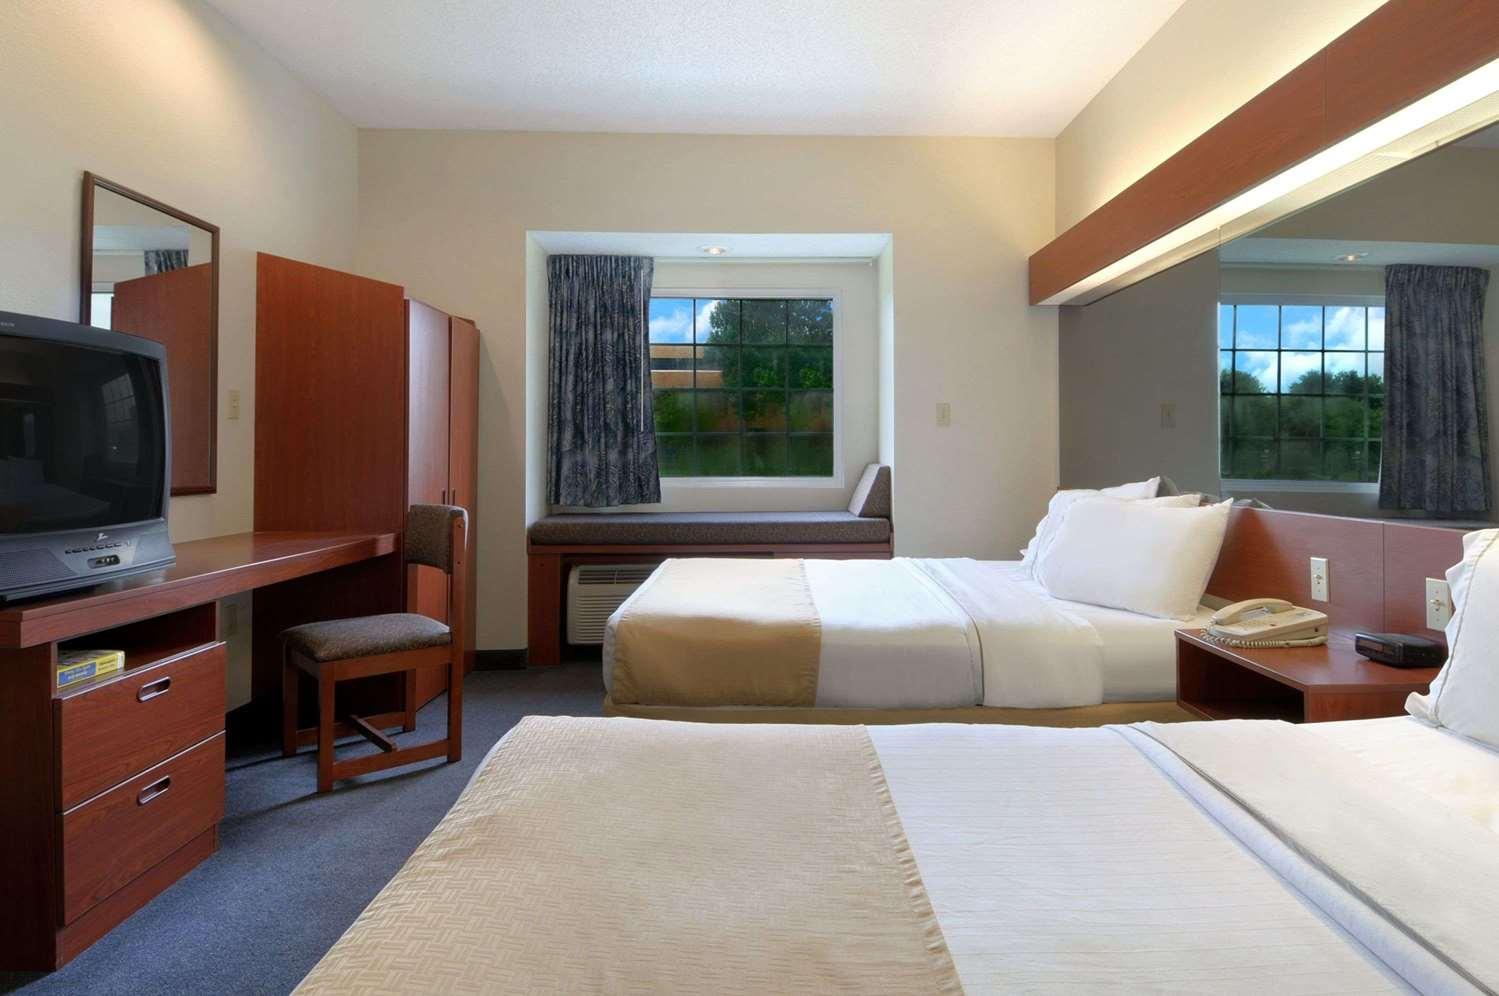 Room - Microtel Inn & Suites by Wyndham Bossier City